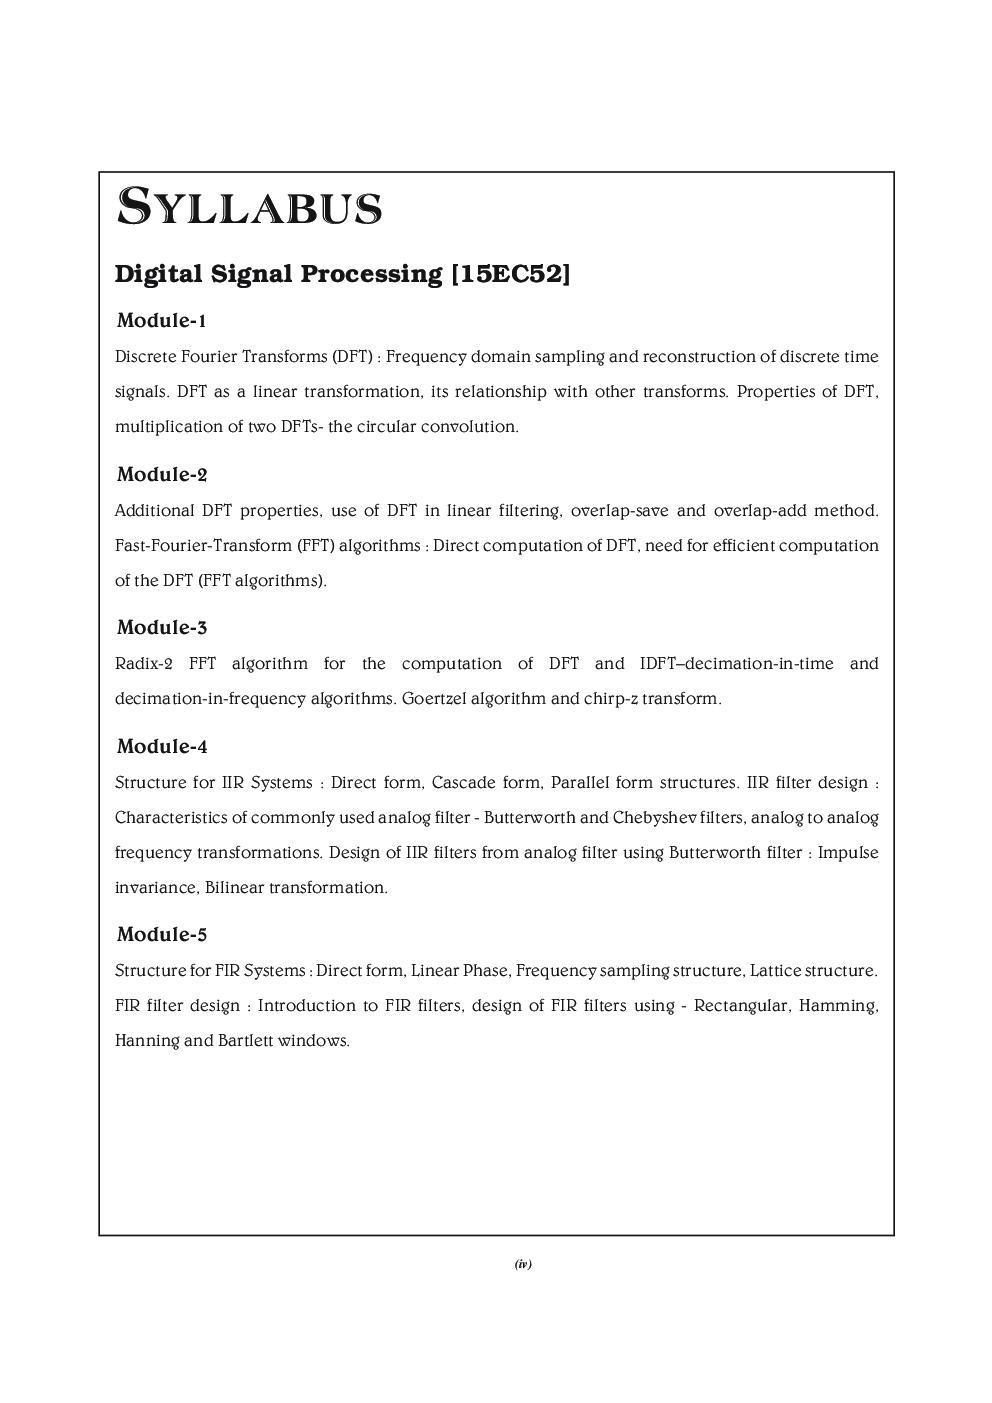 Digital Signal Processing For VTU - Page 5